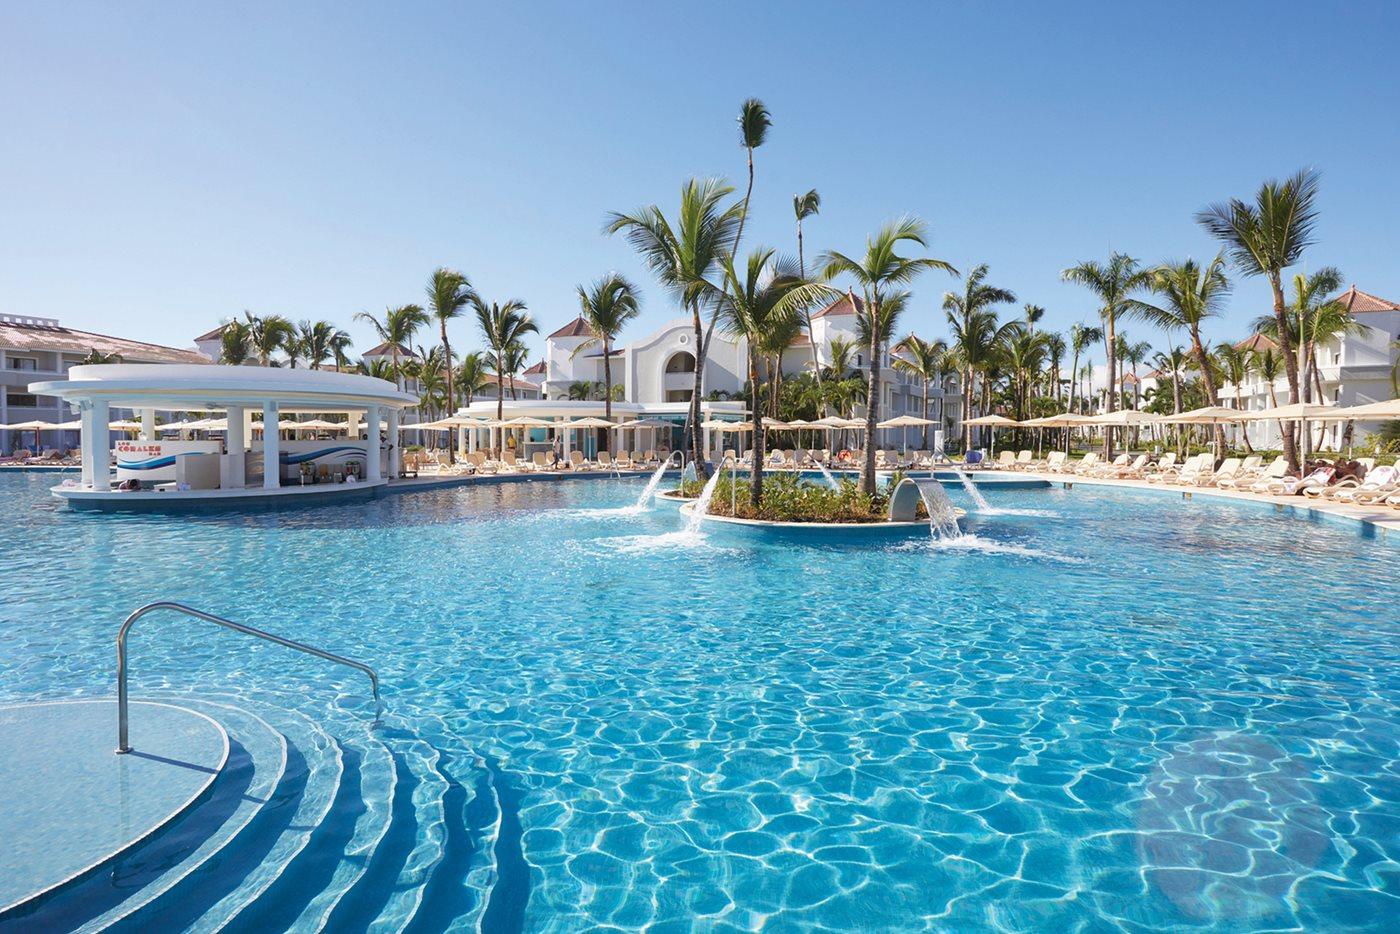 Luxury-Bahia-Principe-Ambar-Pool-003.jpeg